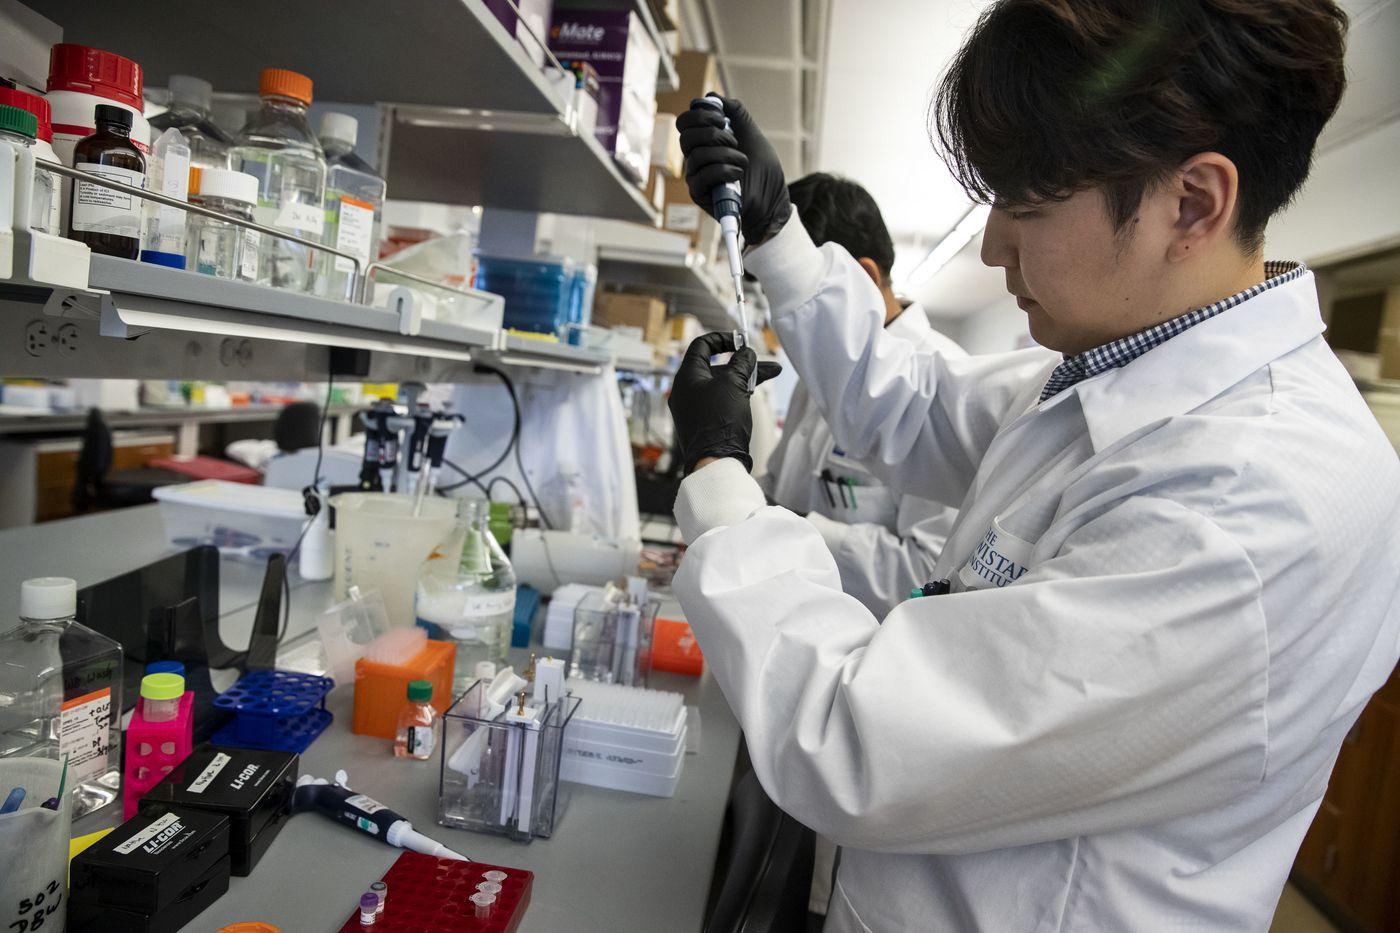 University of Pennsylvania graduate student Daniel Park tests a coronavirus vaccine at the Wistar Institute in February.